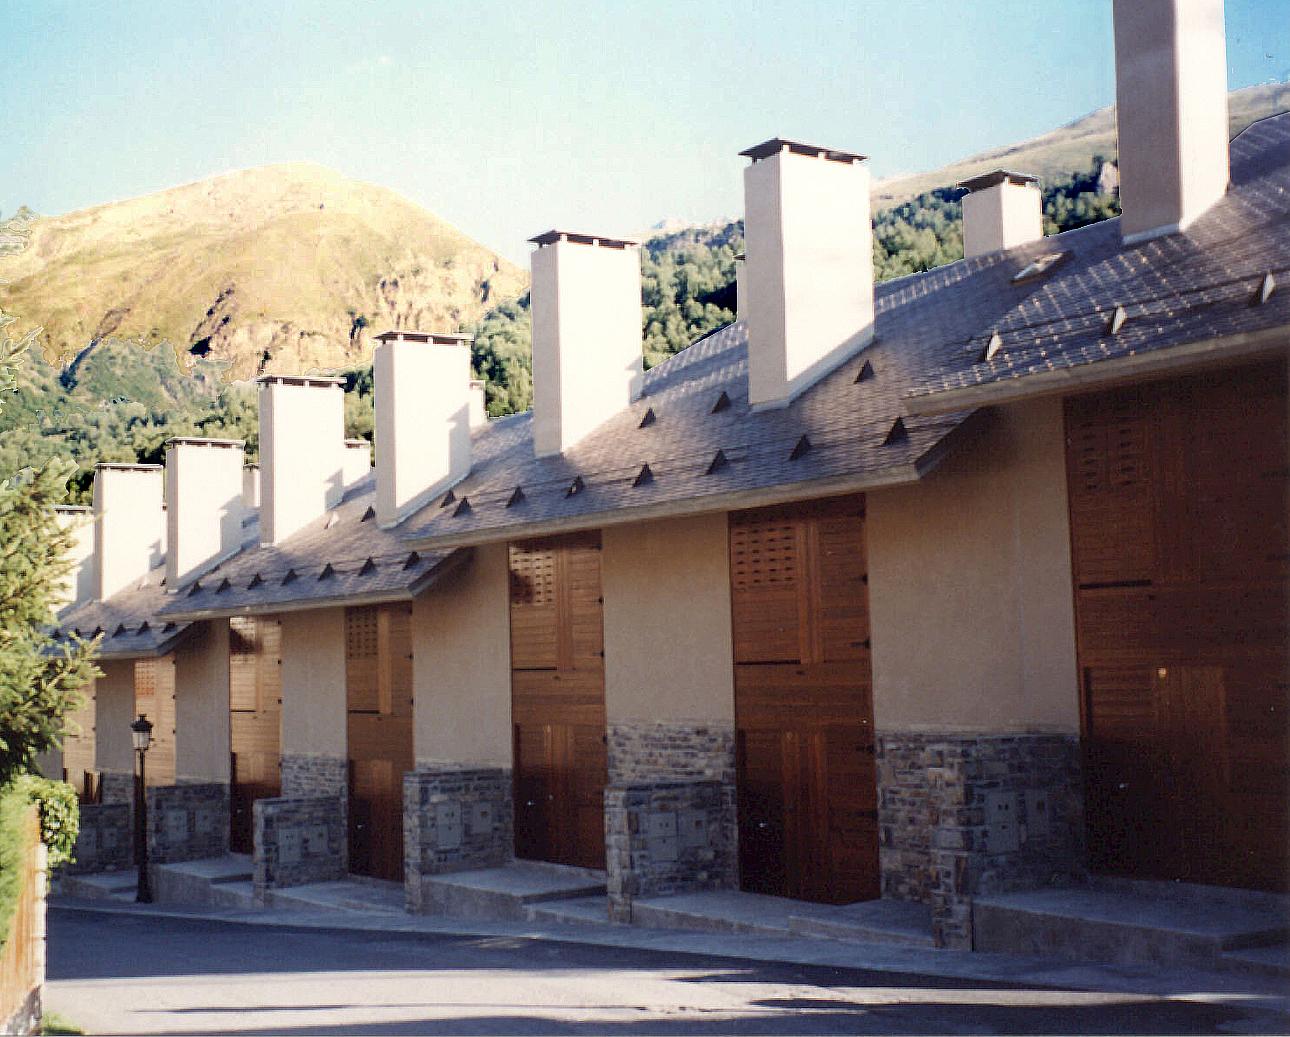 Viviendas en Panticosa, Huesca